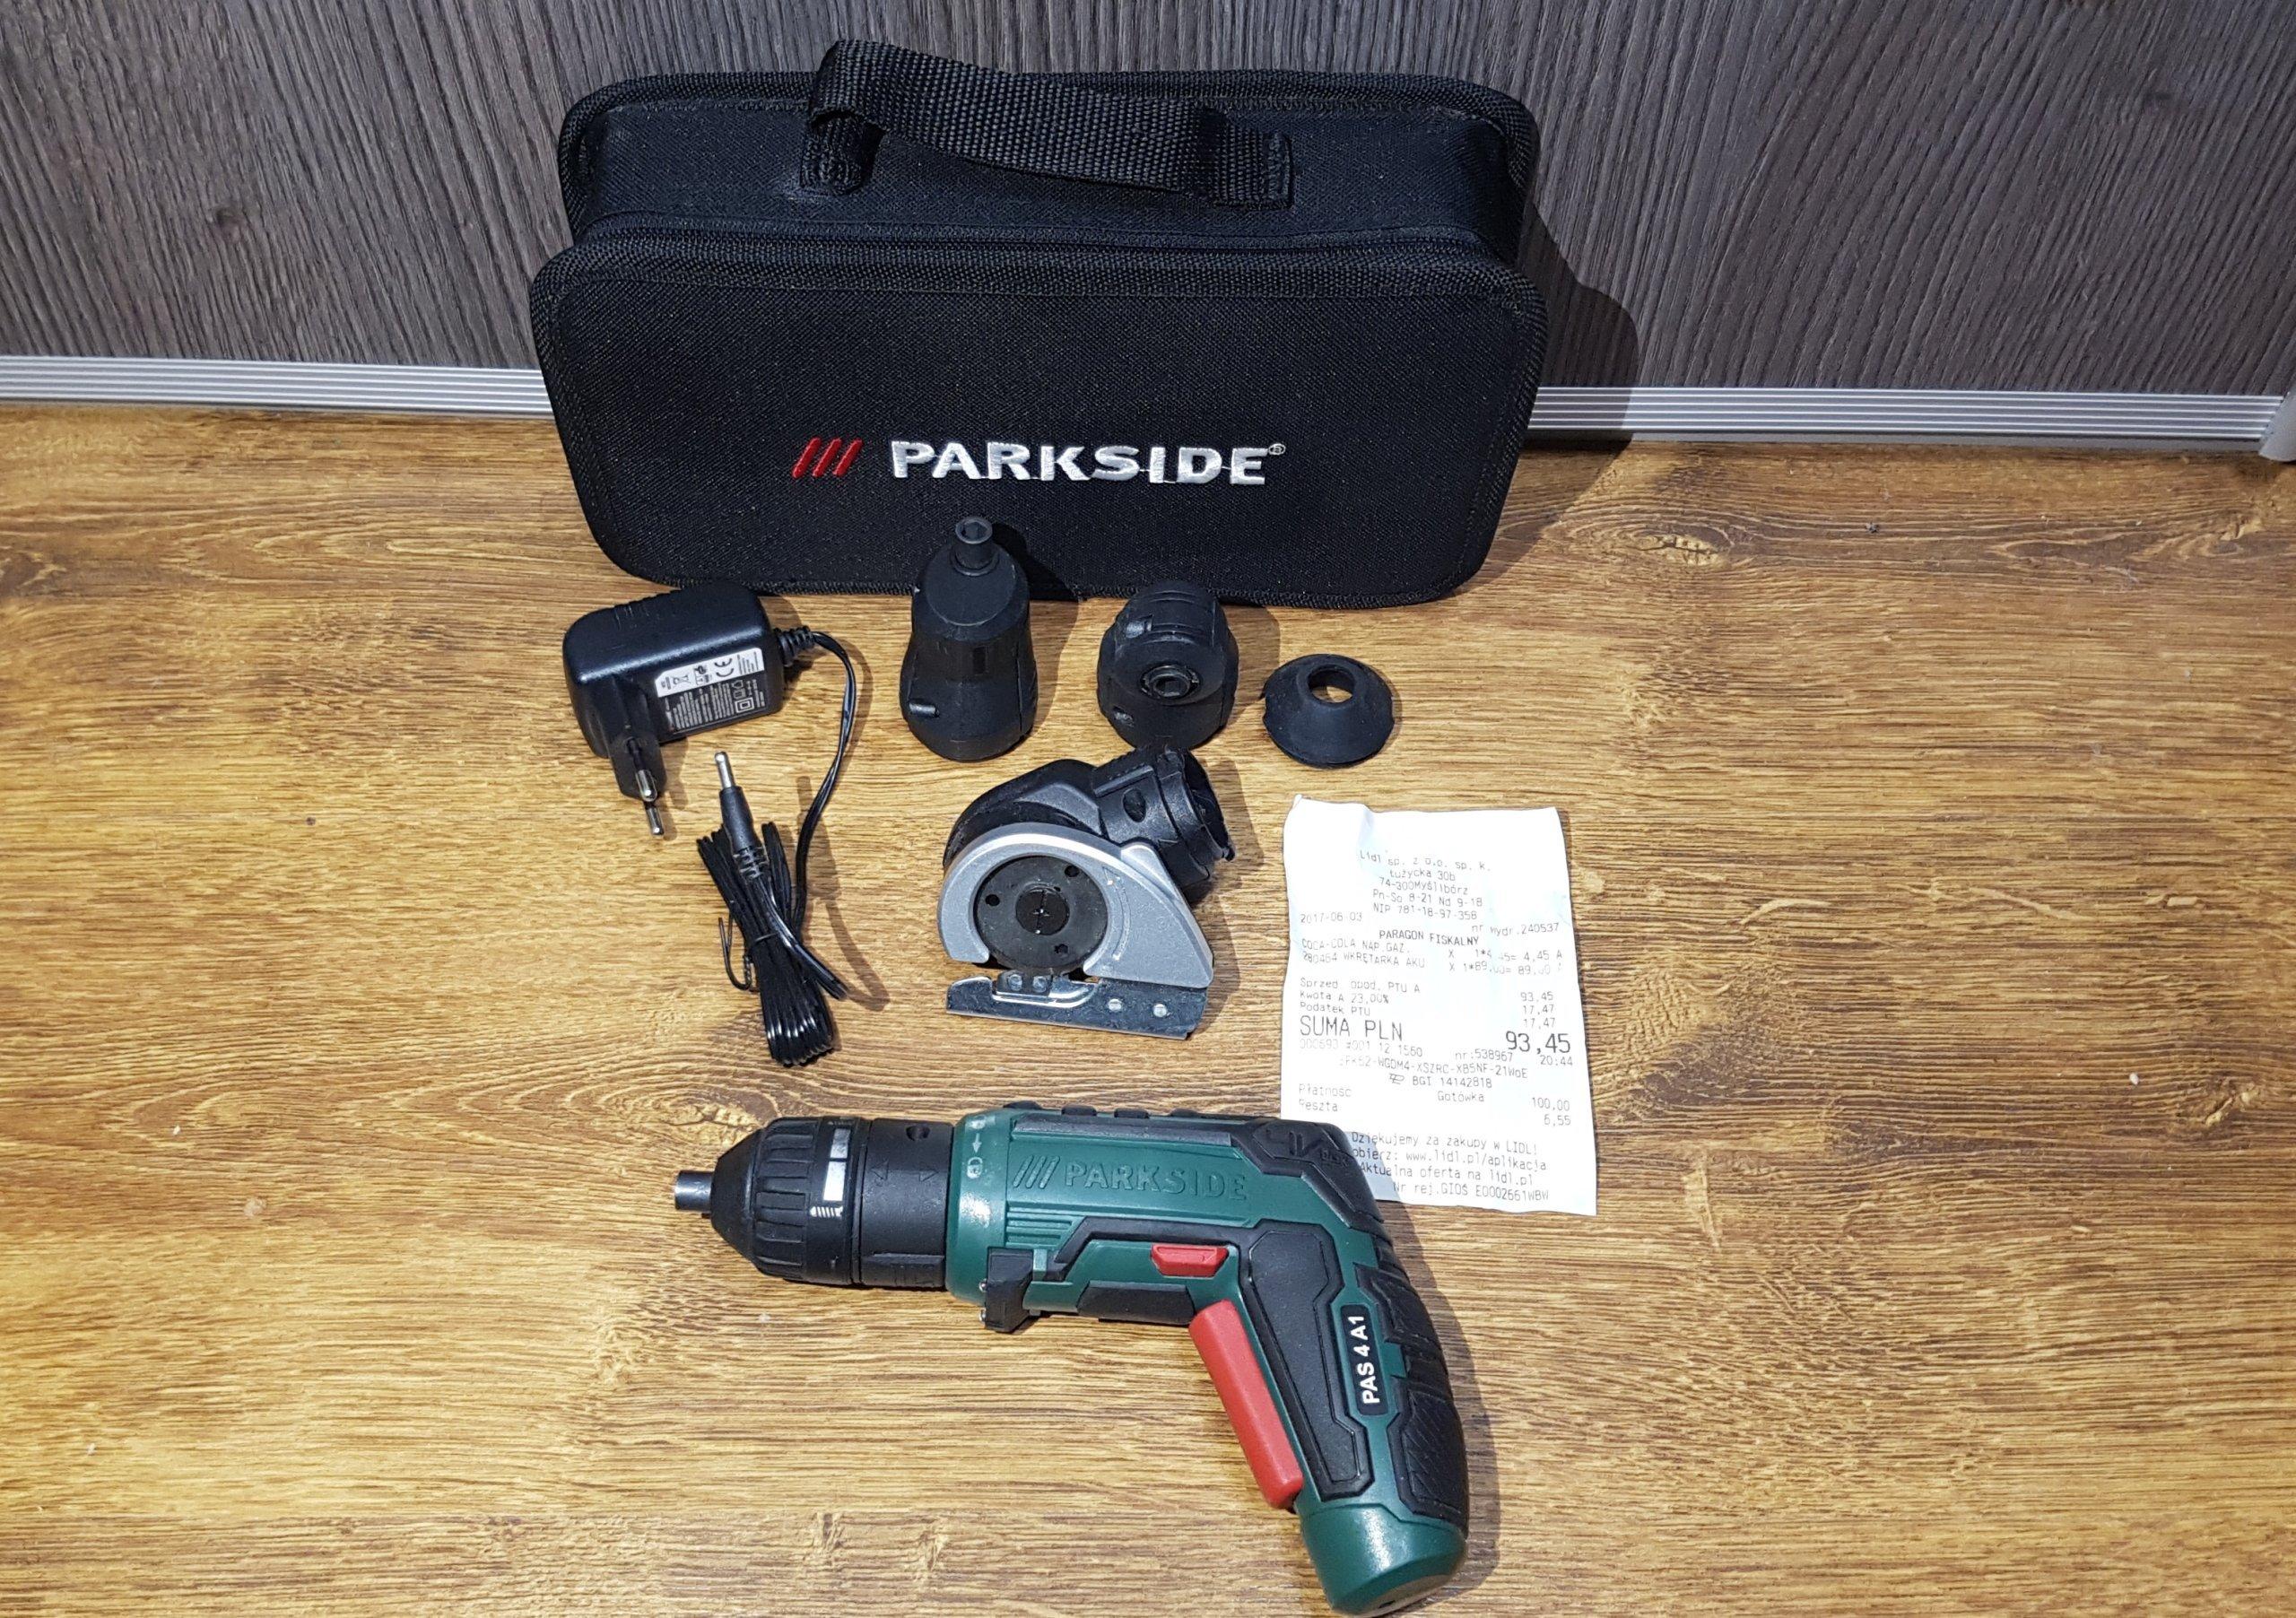 Wkrętak akumulatorowy Parkside PAS 4 A1 GW  LIDL